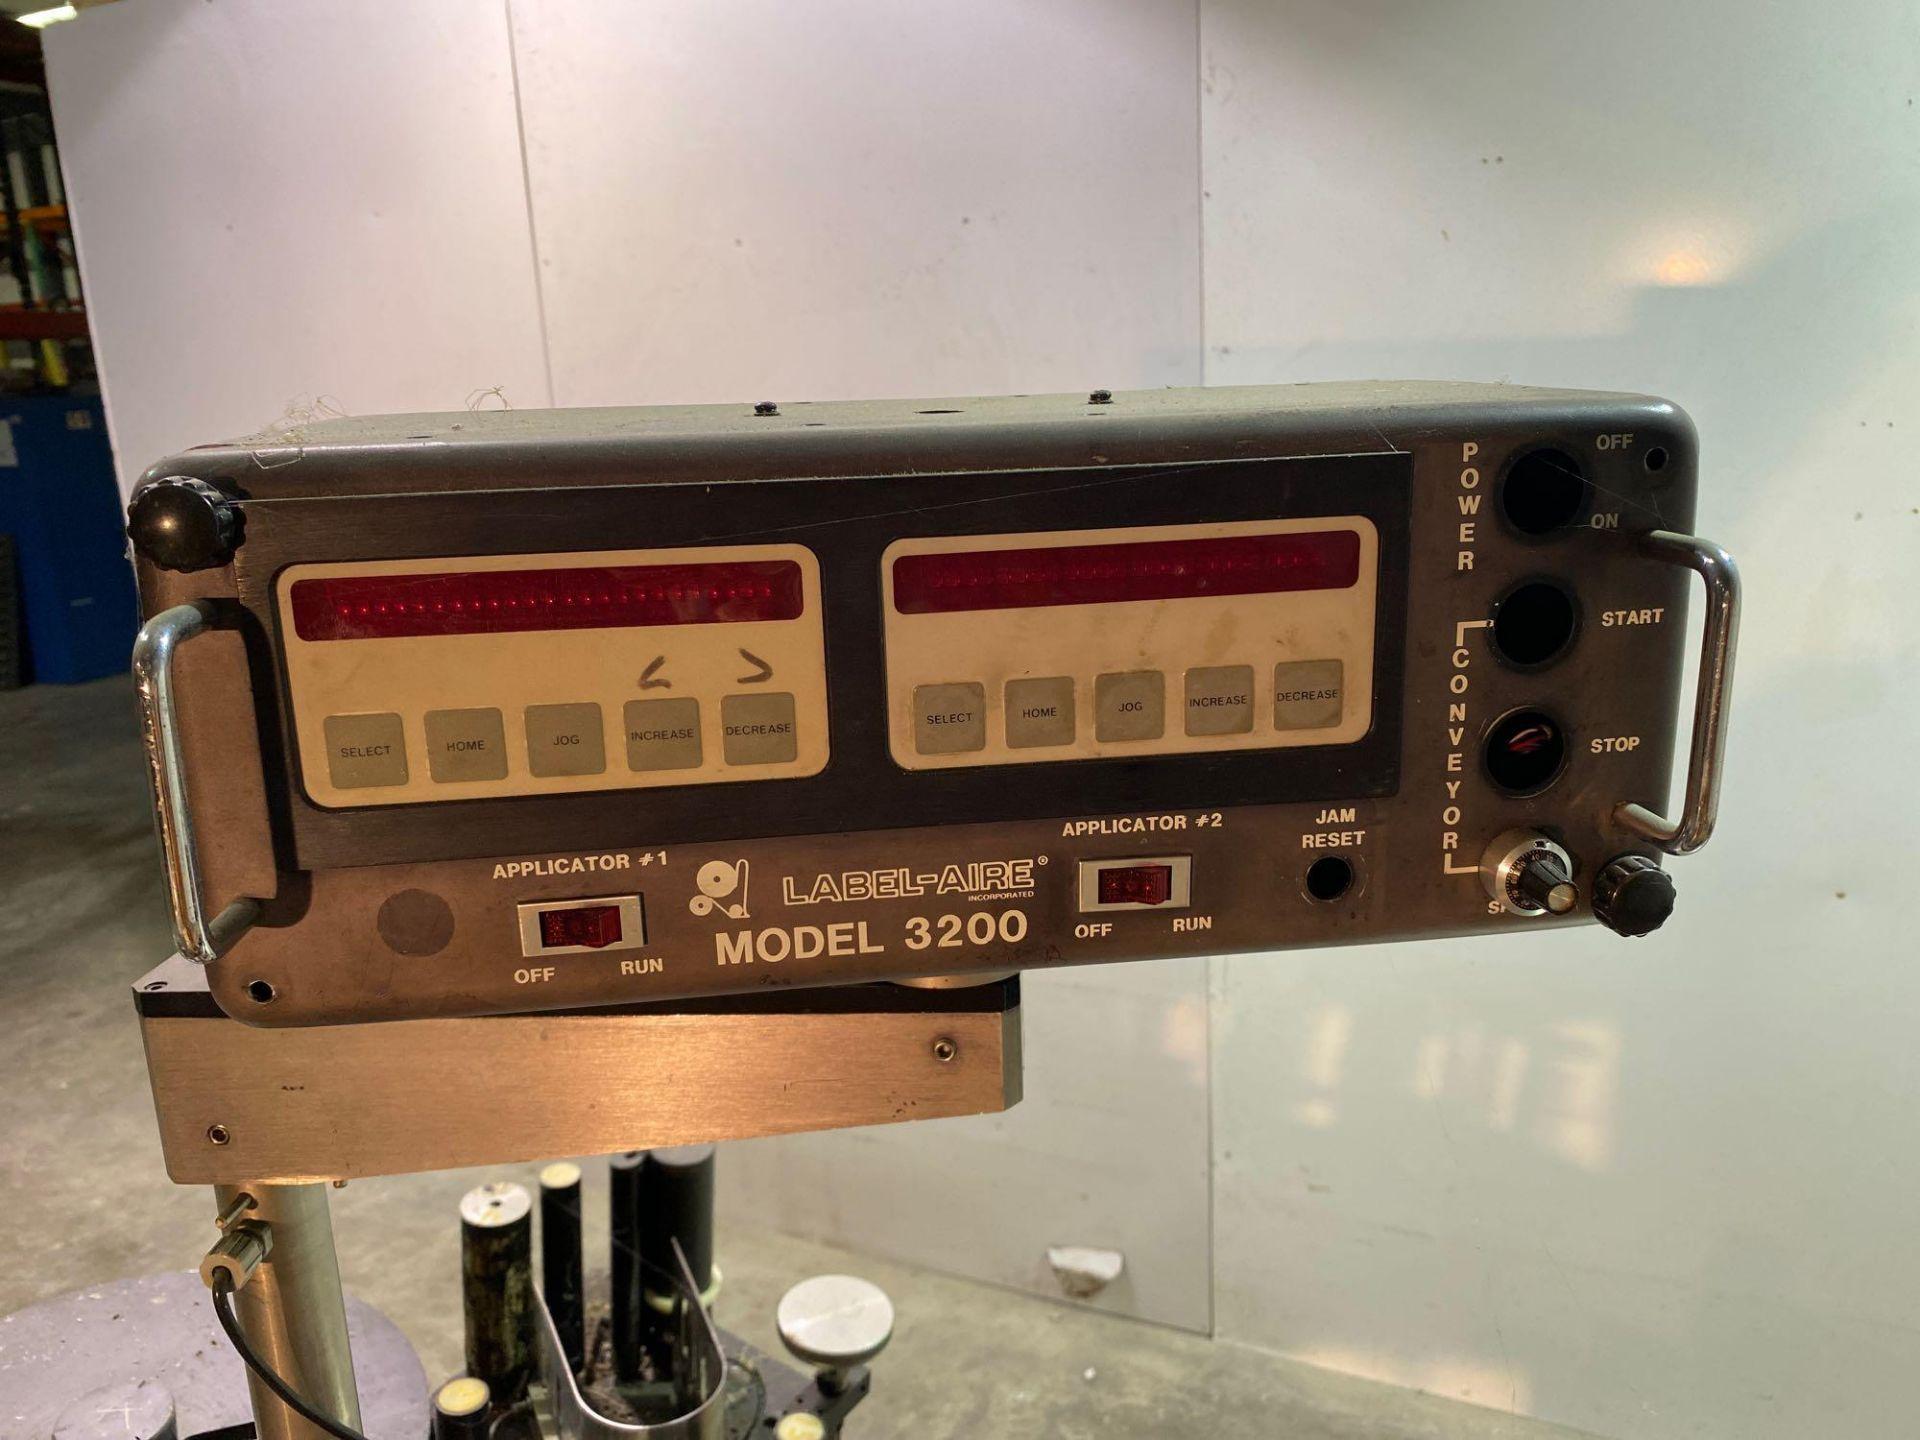 Label-Aire Model 3200 Conveyorized Pressure Sensitive Labeler - Image 9 of 14